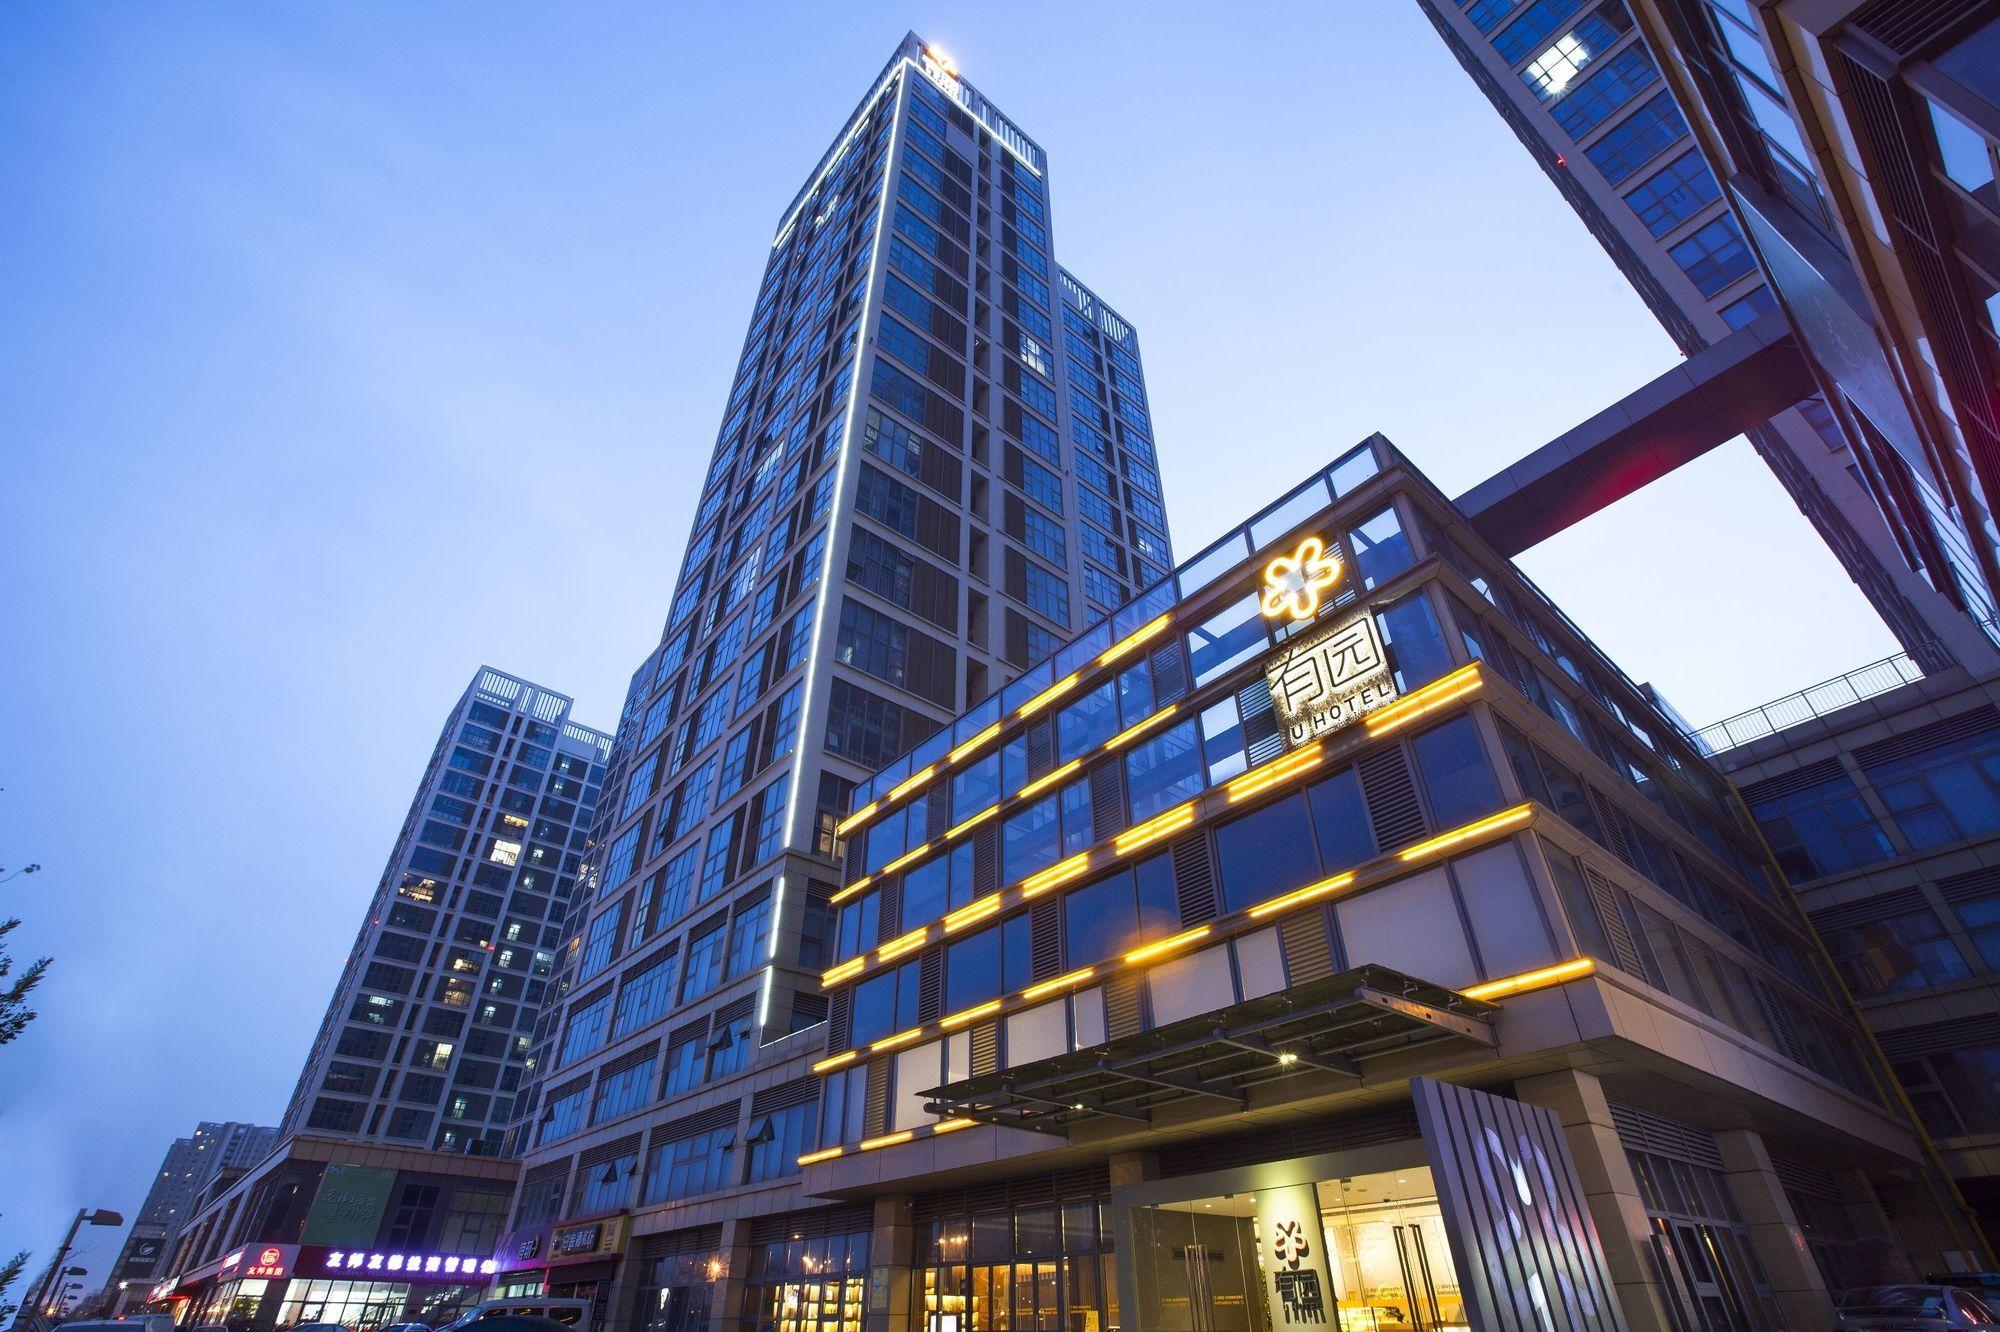 U Hotel Tianjin